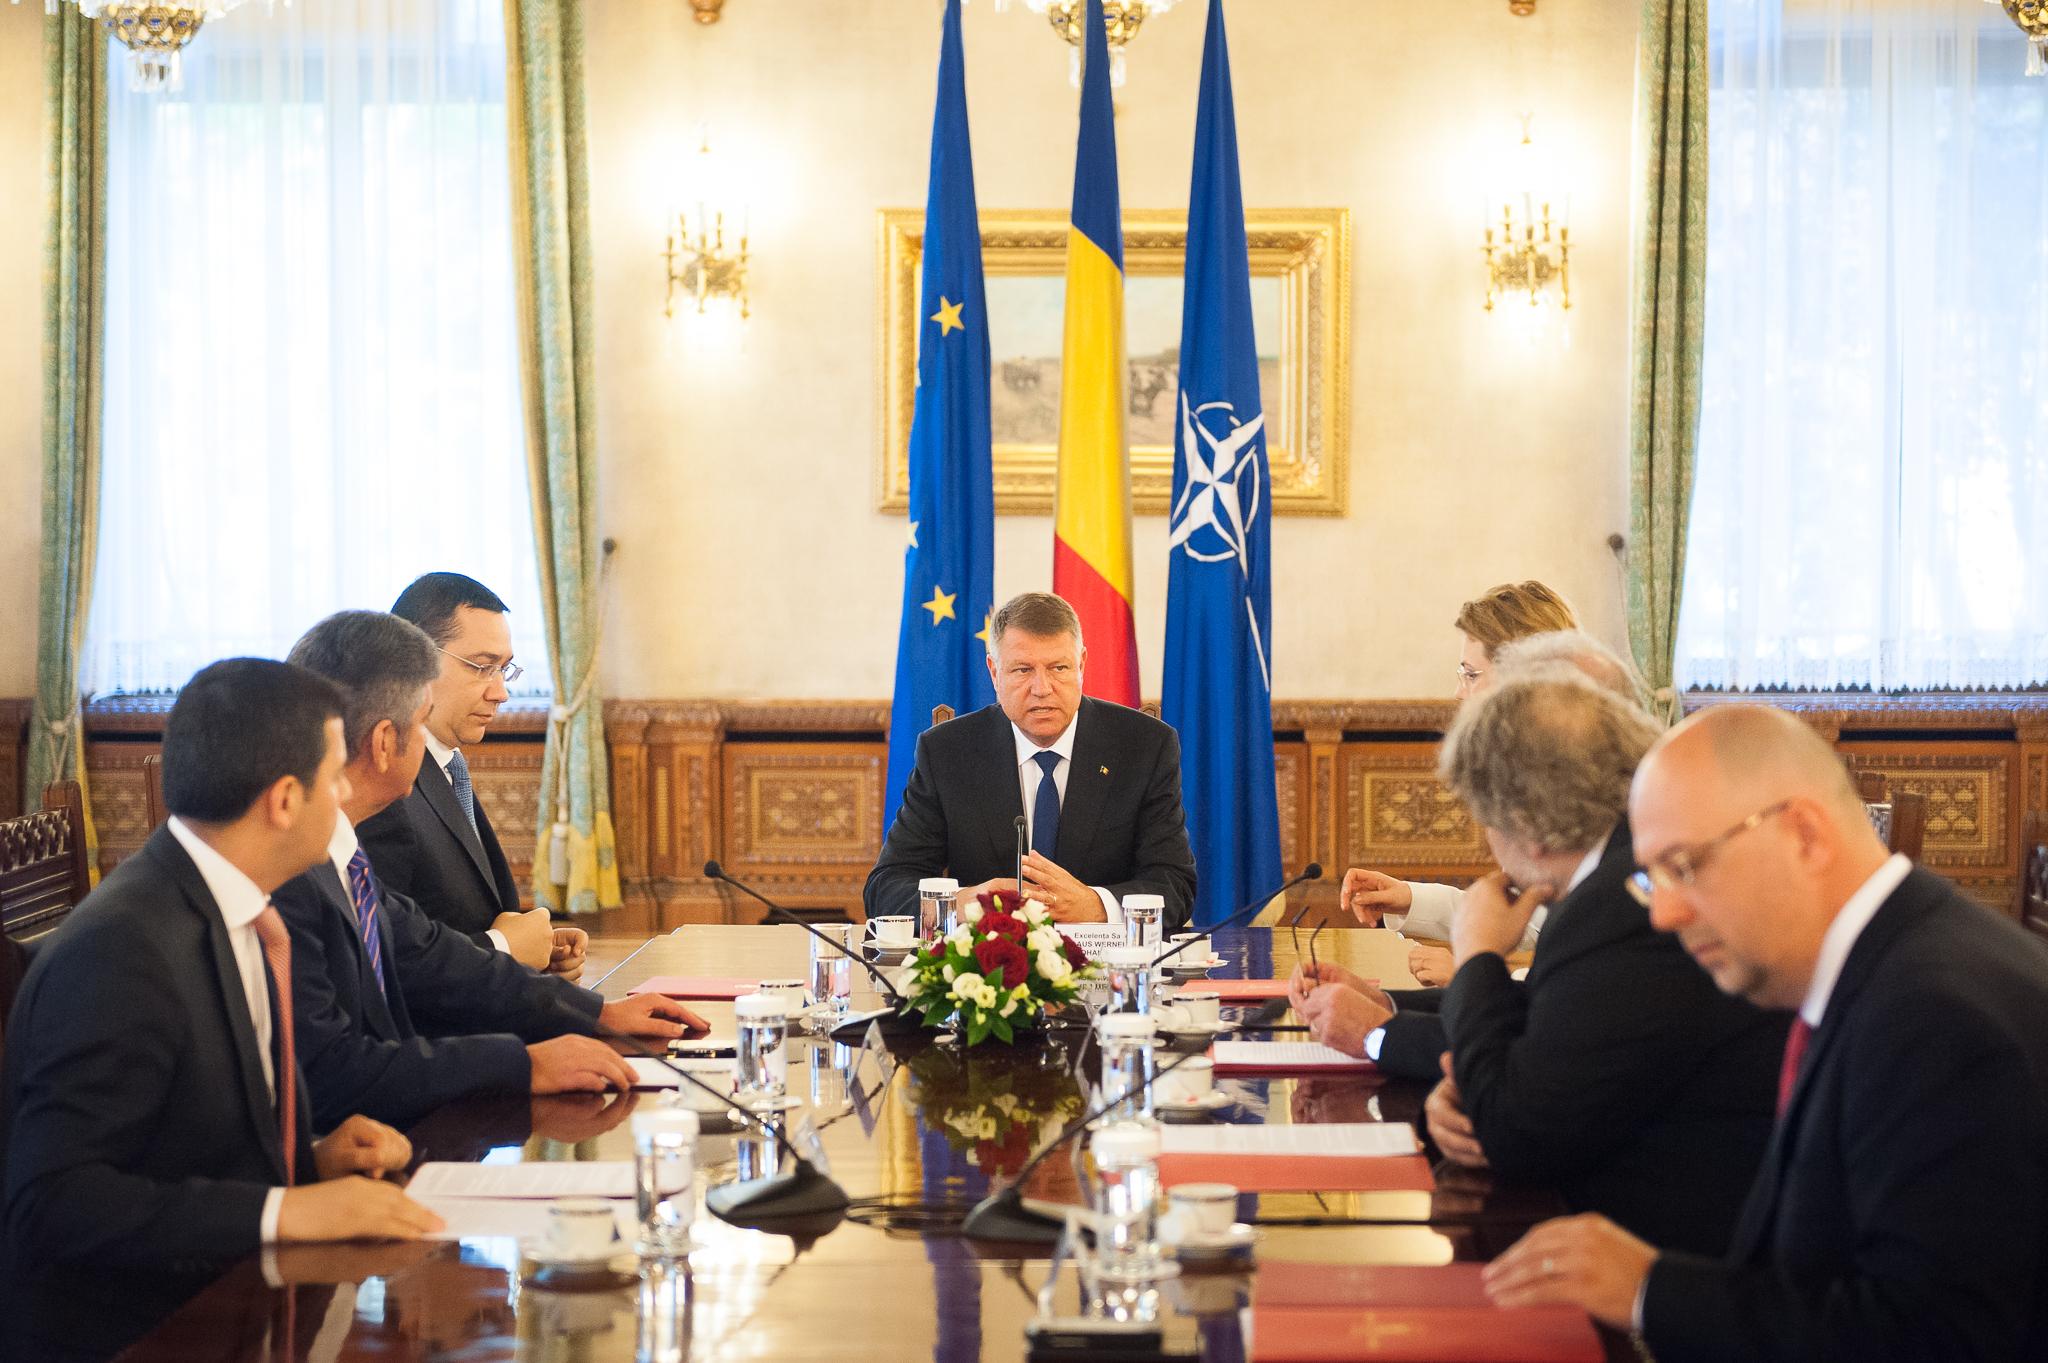 Blitzkrieg fara precedent in Romania: Iohannis si Ponta DAU PRIMA MARE LOVITURA politica, efectele sunt extrem de importante!